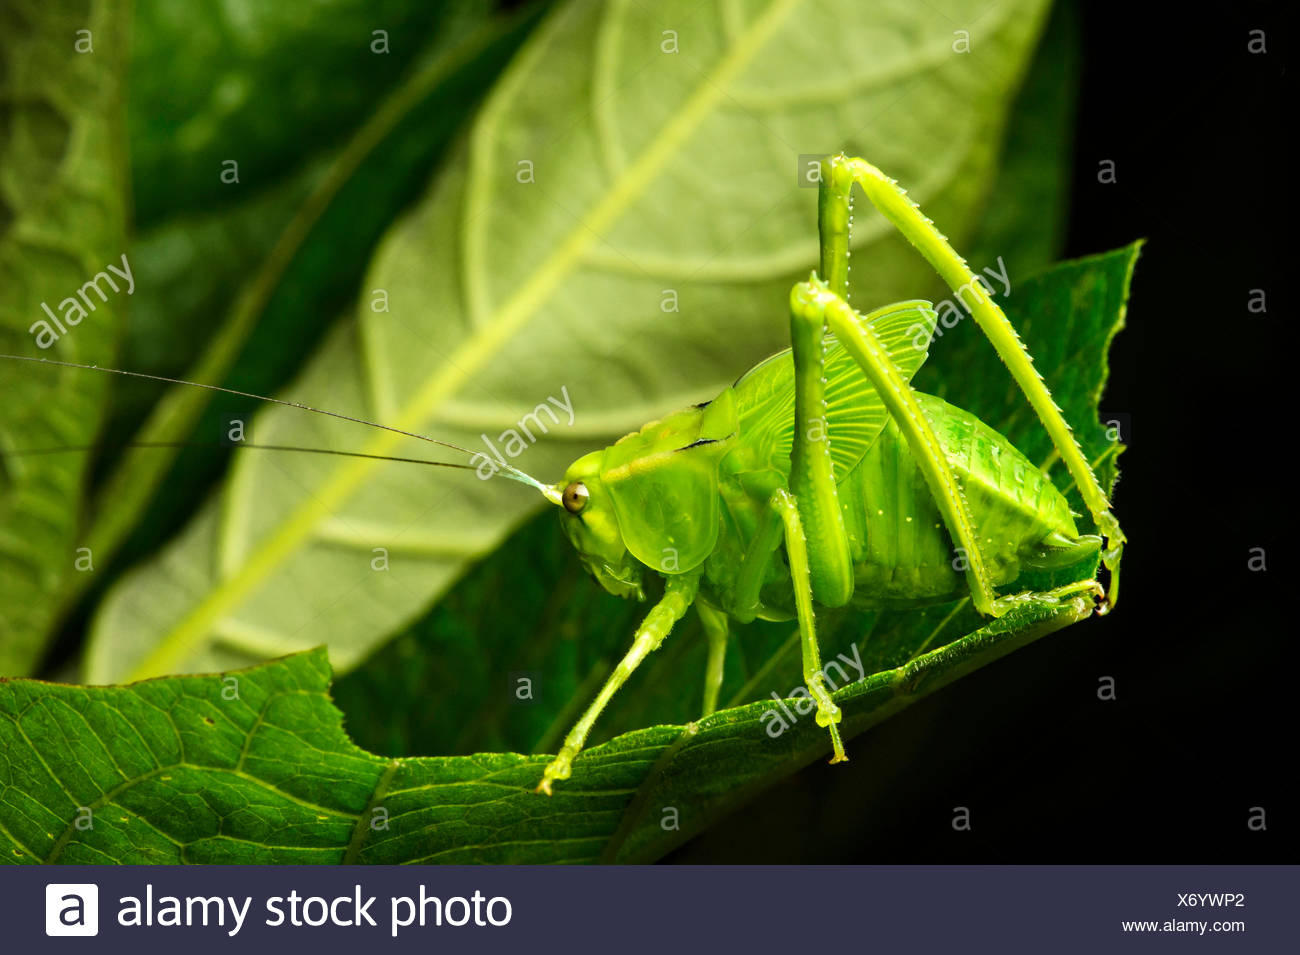 Nymph of a katydid (Tettigoniidae), Andean cloud forest, Mindo, Ecuador Stock Photo